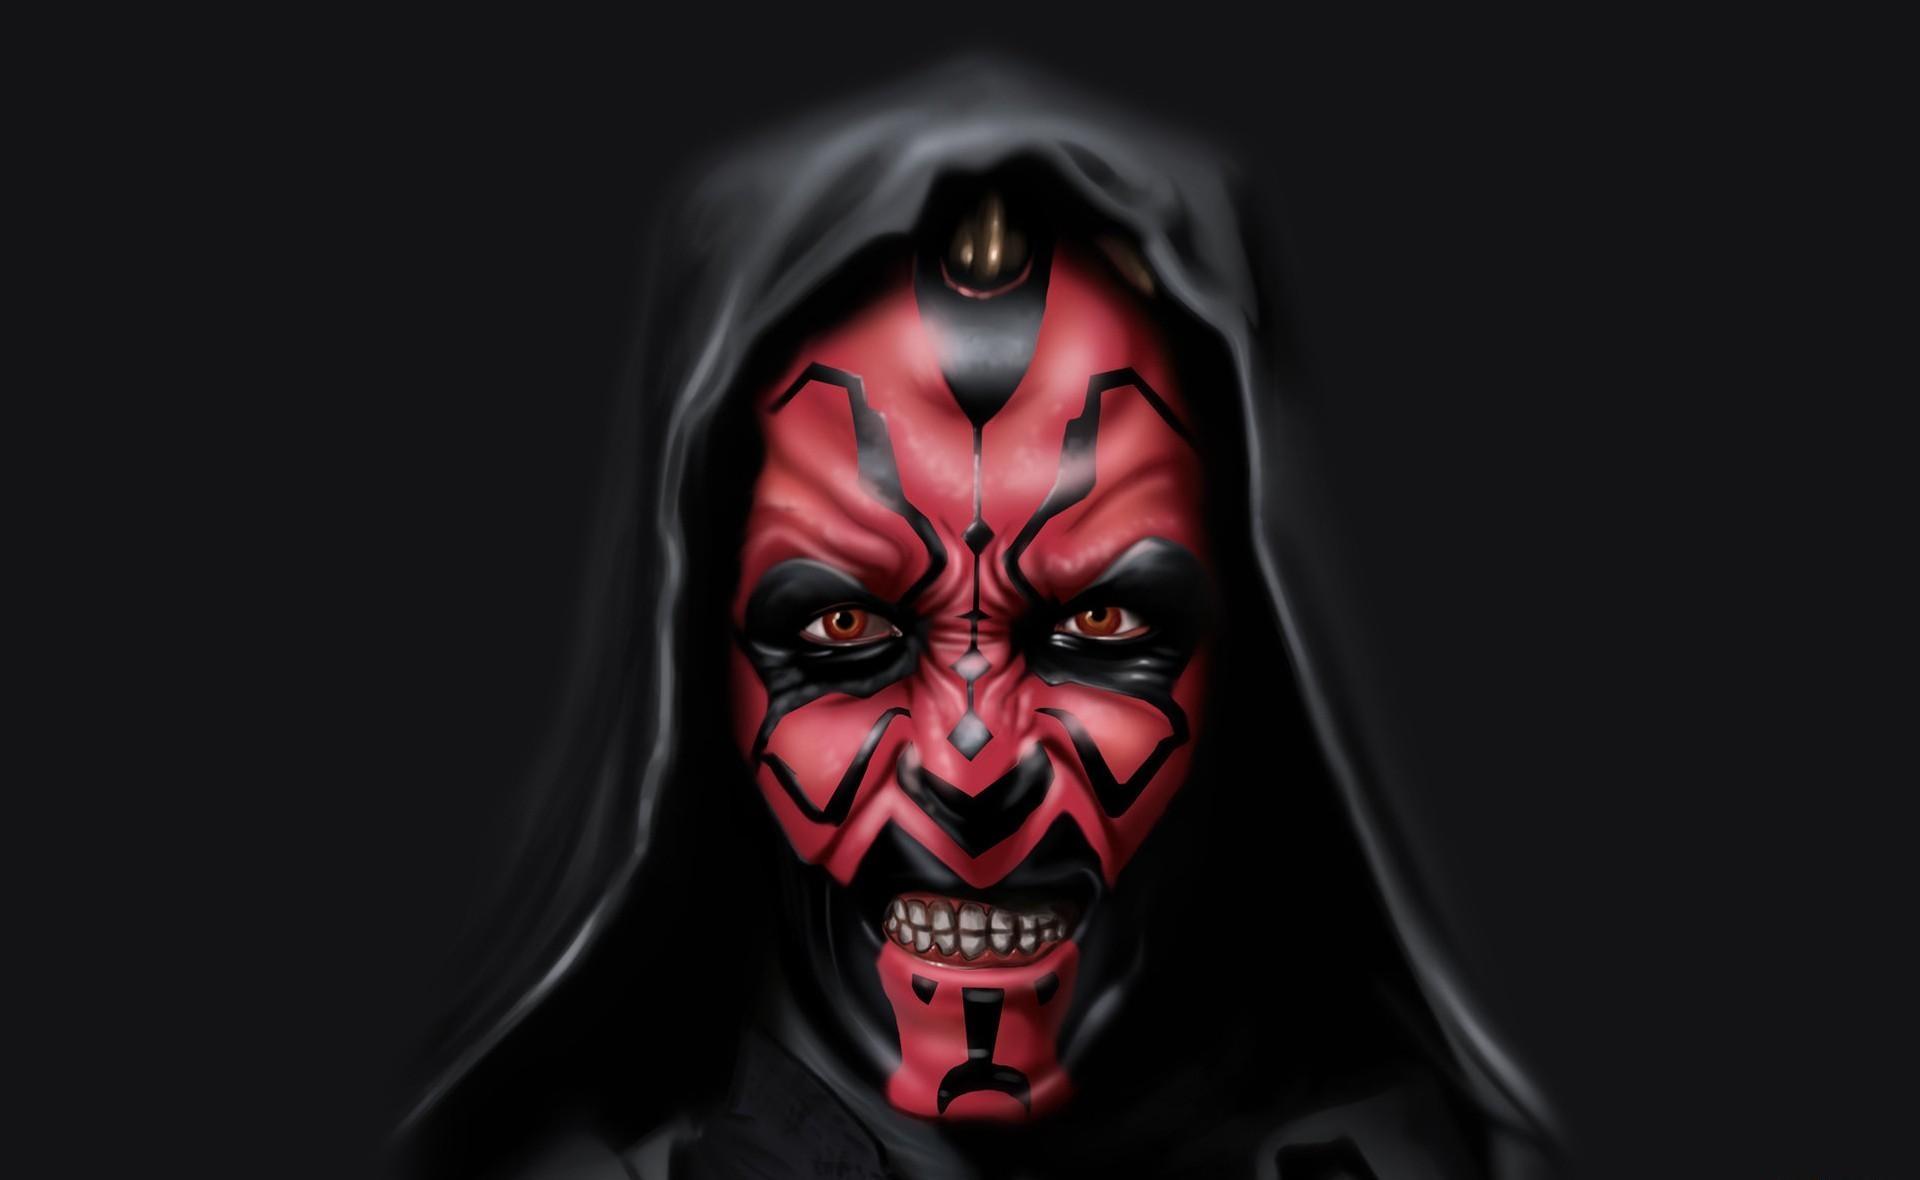 Best Wallpaper Halloween Star Wars - Sith-Star-Wars-Darth-Maul-dark-side-648100  Trends_312933.jpg